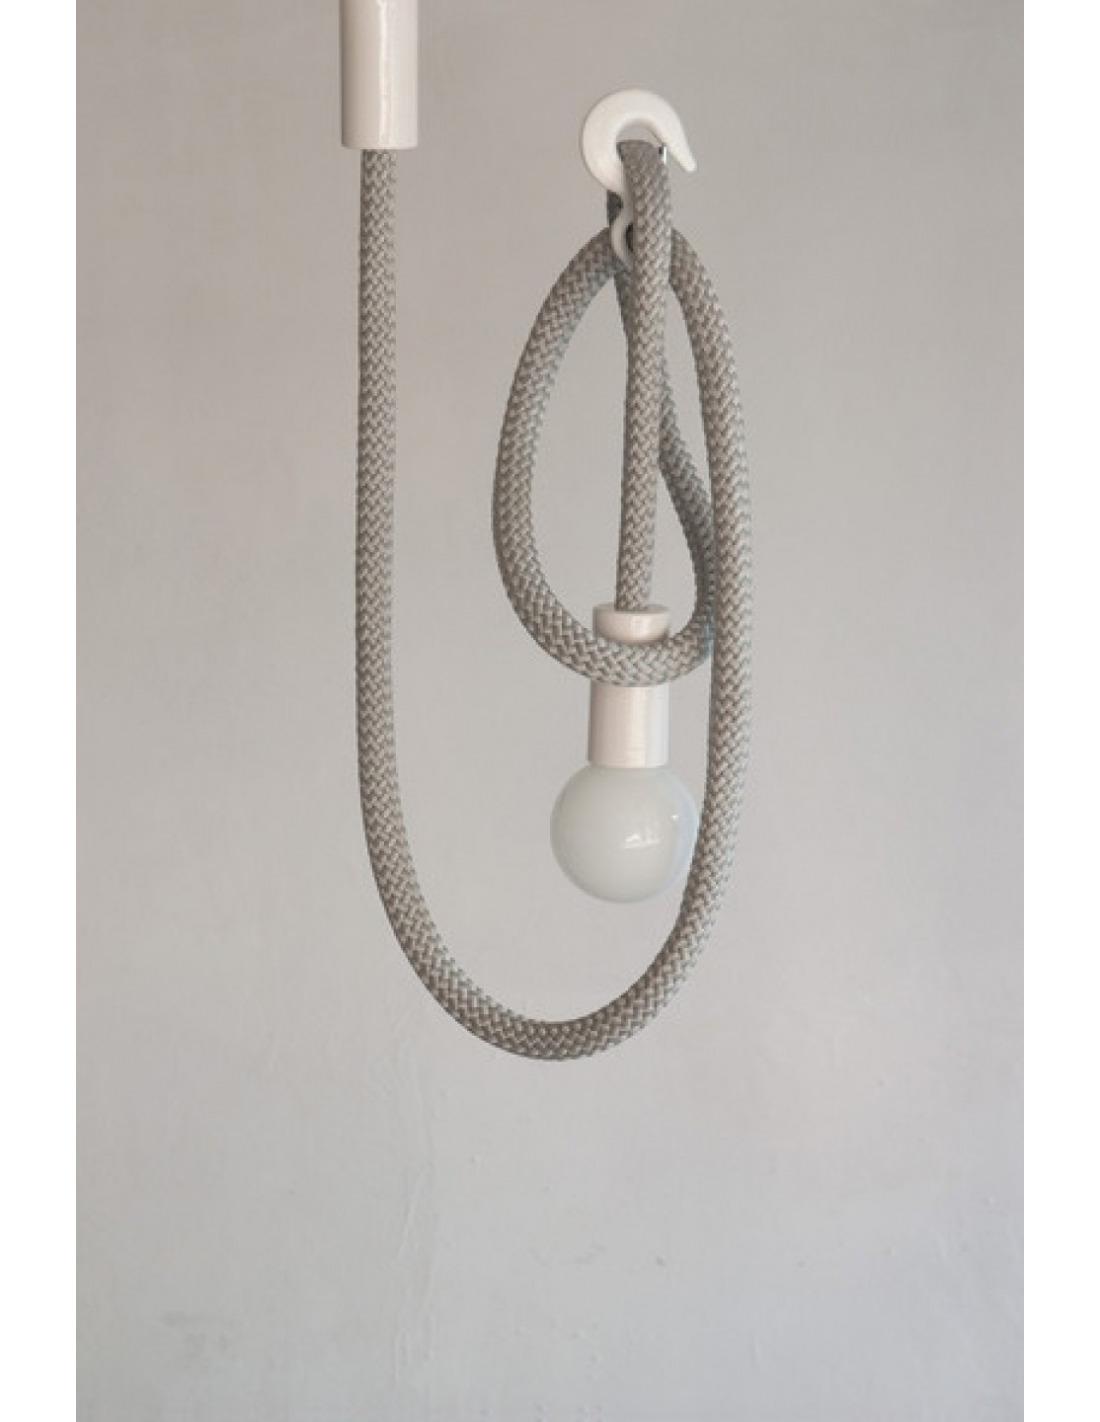 suspension design corde avec crochet modulable hook line otoko. Black Bedroom Furniture Sets. Home Design Ideas